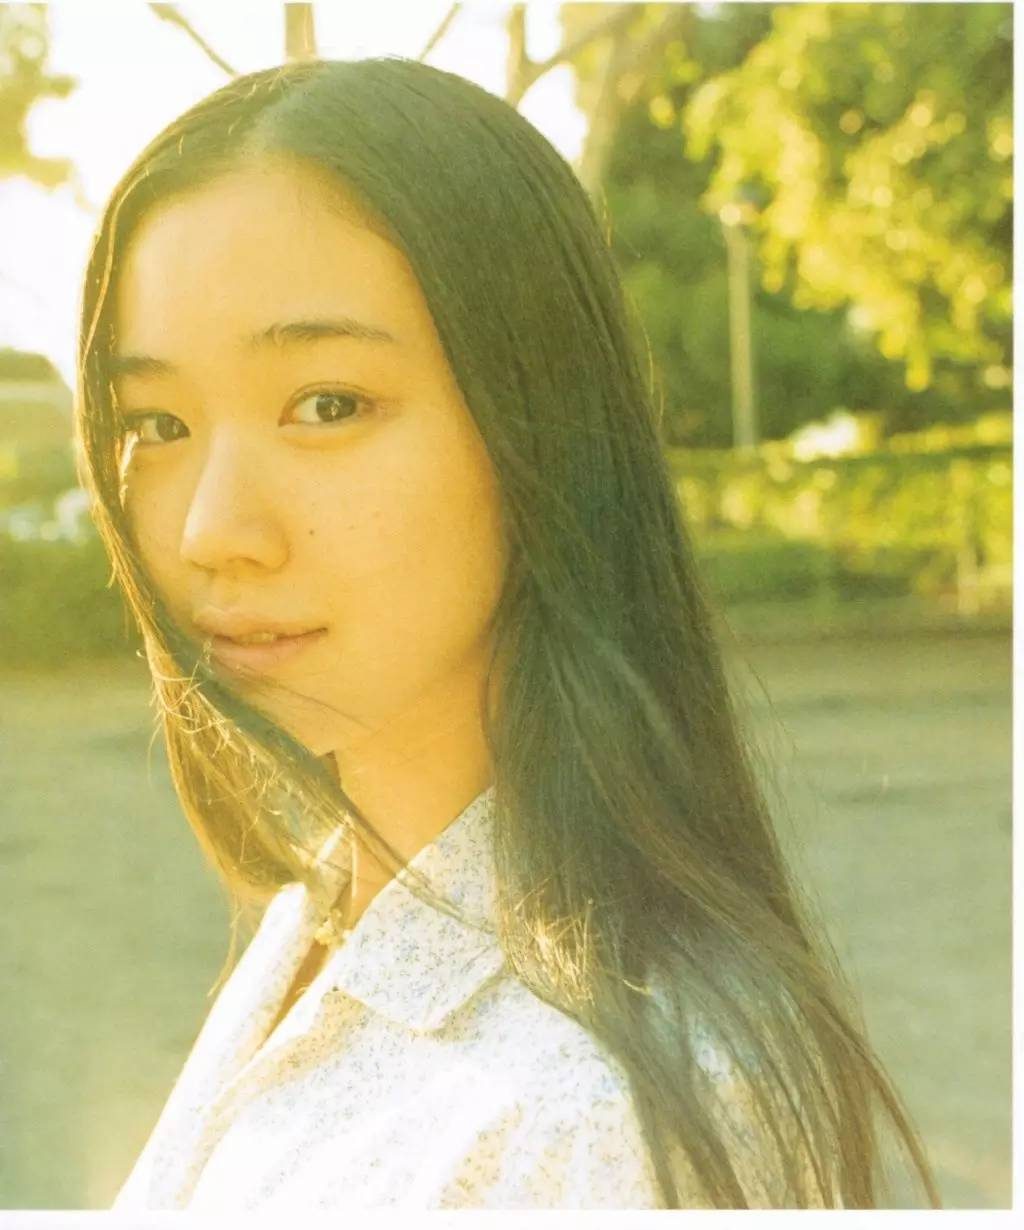 soraaoi无码种子_上田义彦 x 苍井优 yoshihiko ueda x yu aoi a dream